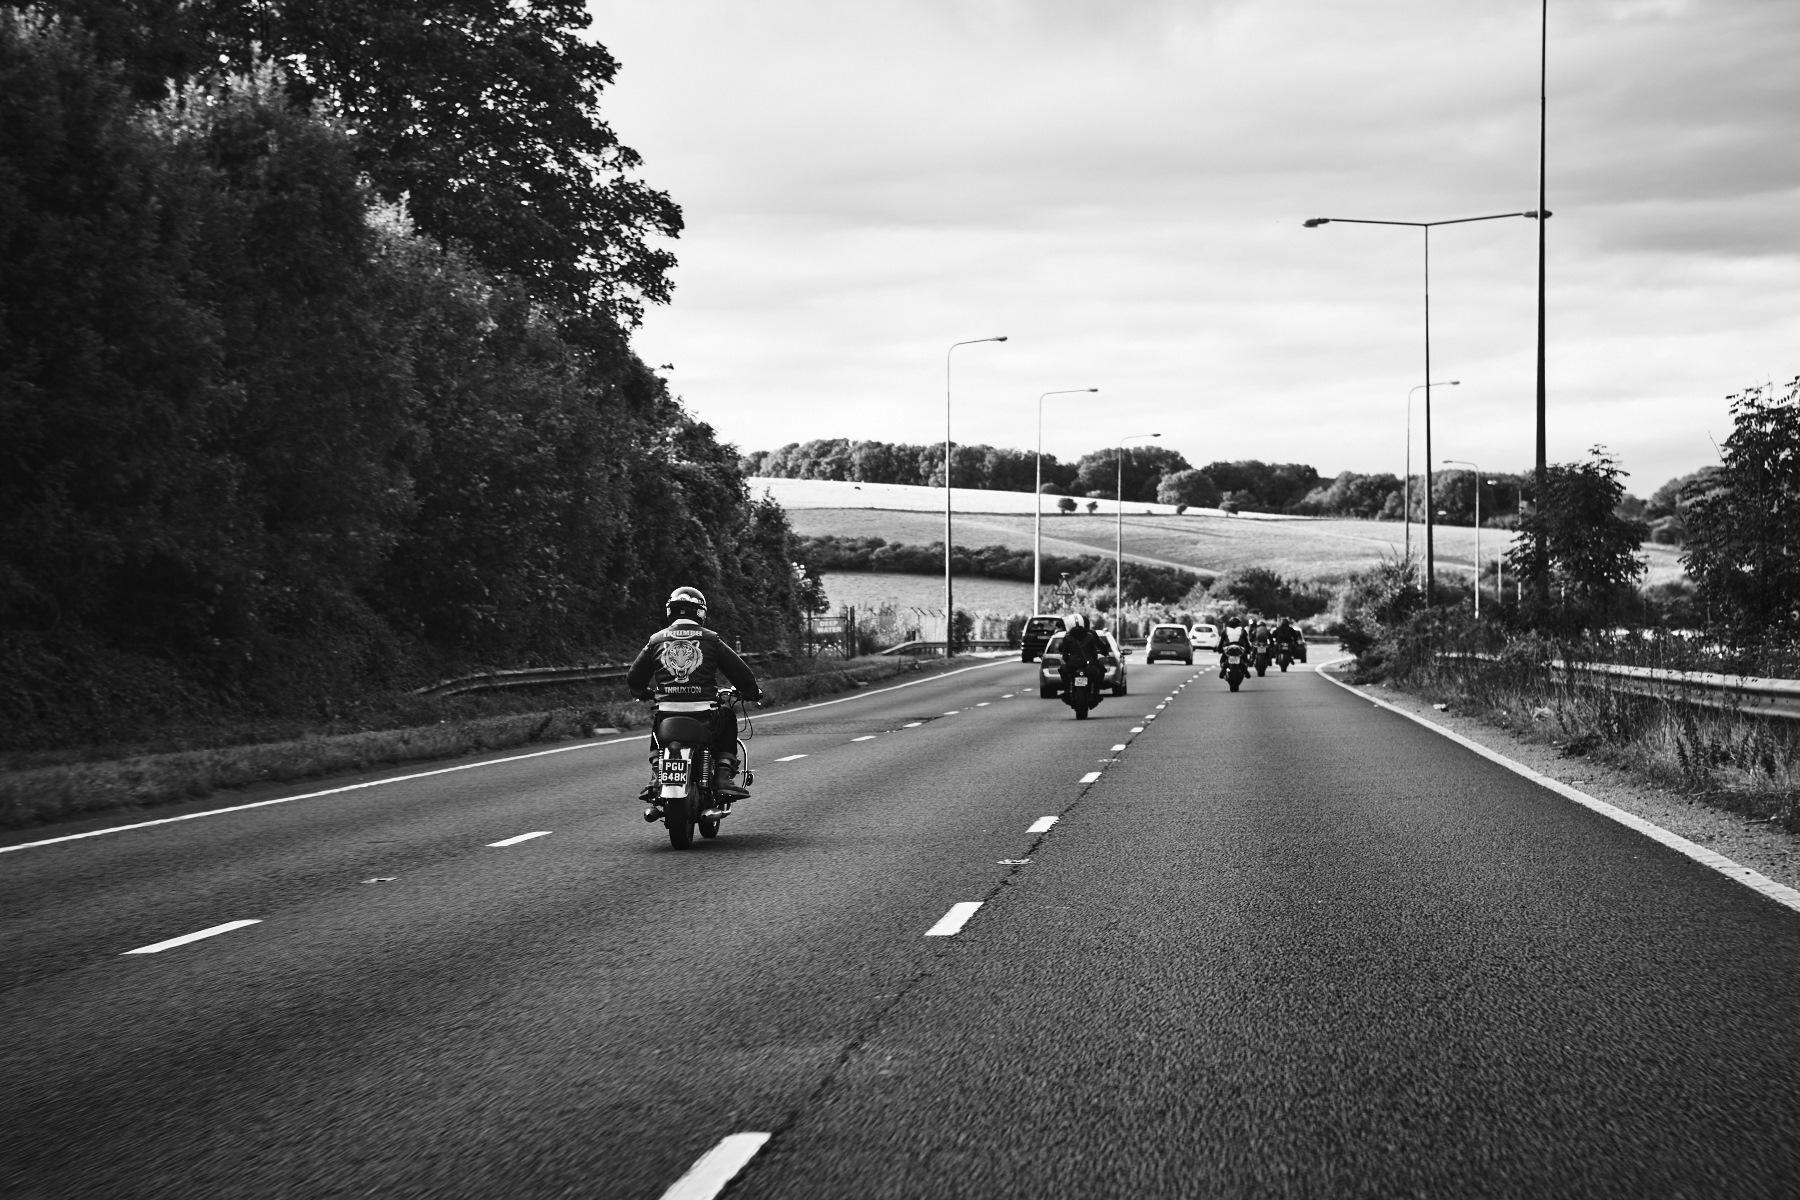 2015_09_13_RideOut_365_byFabioAffuso.jpg